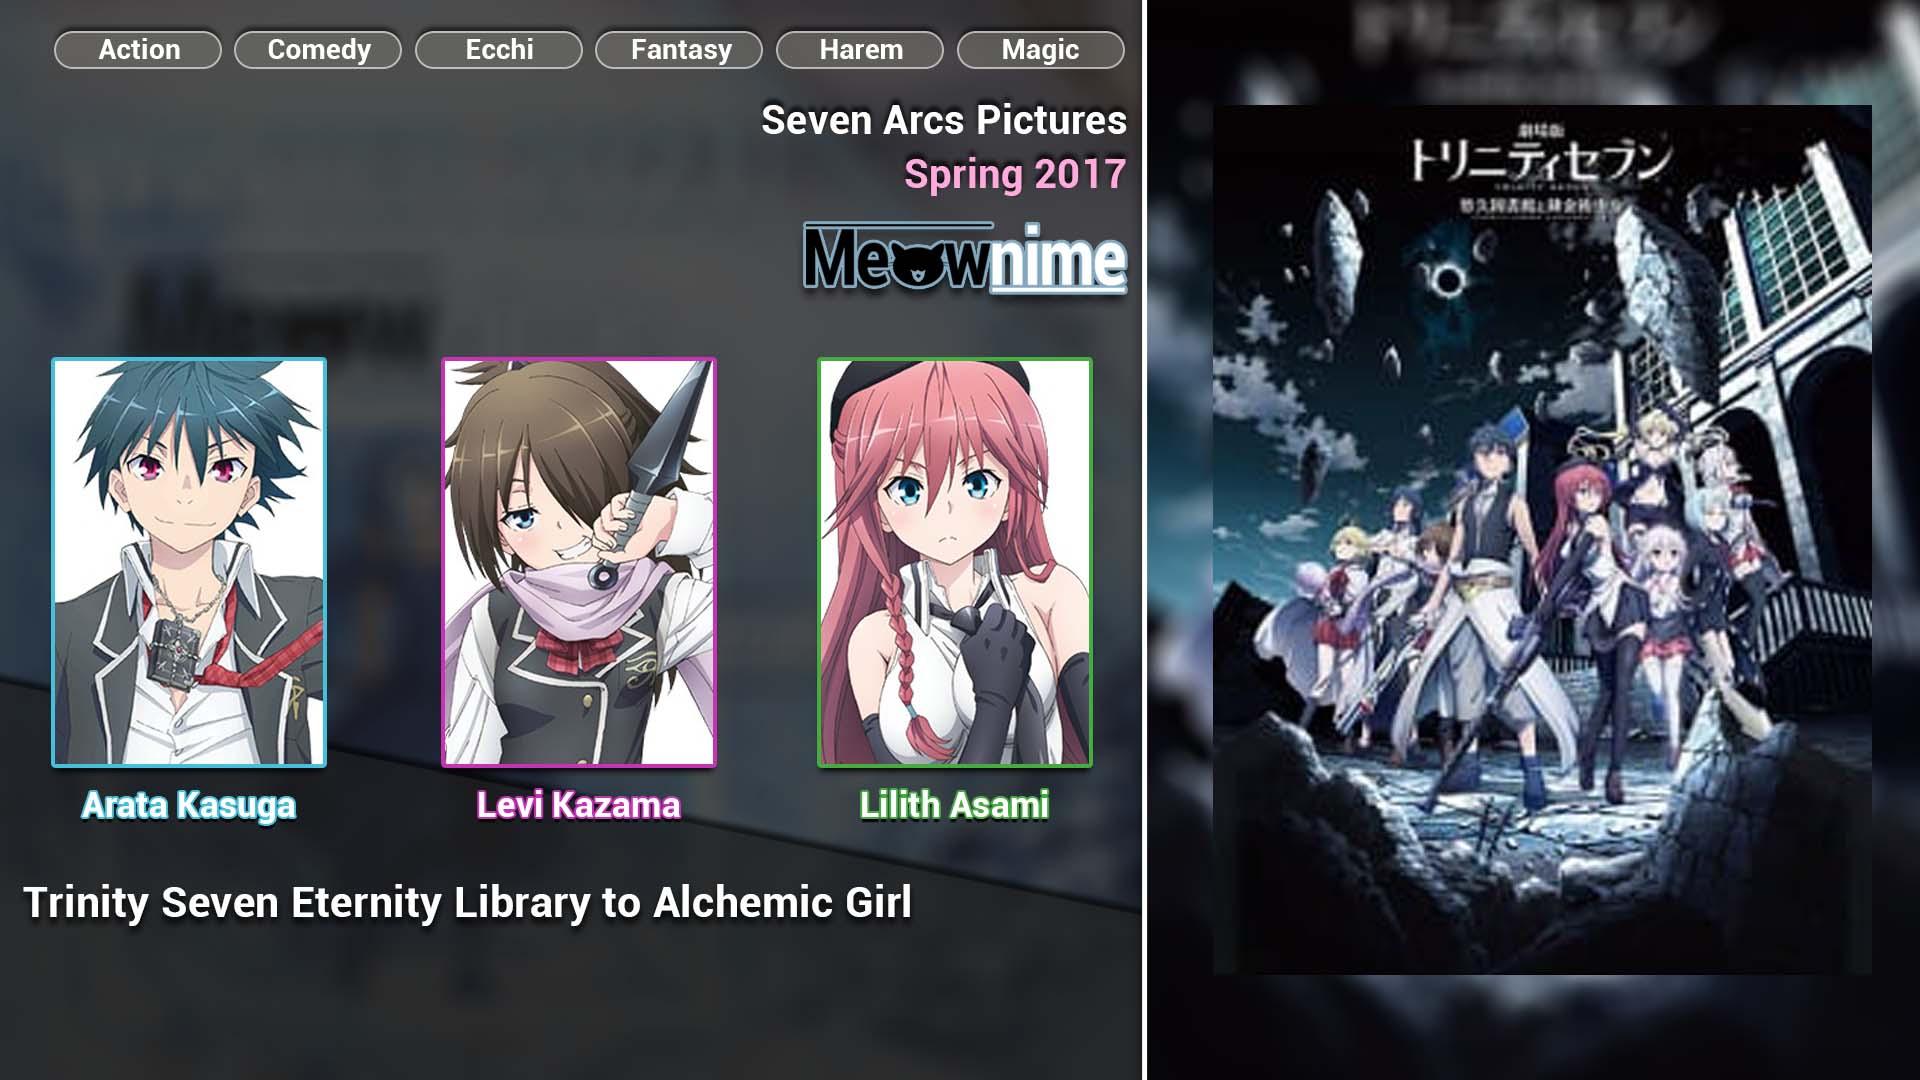 Trinity Seven Eternity Library to Alchemic Girl